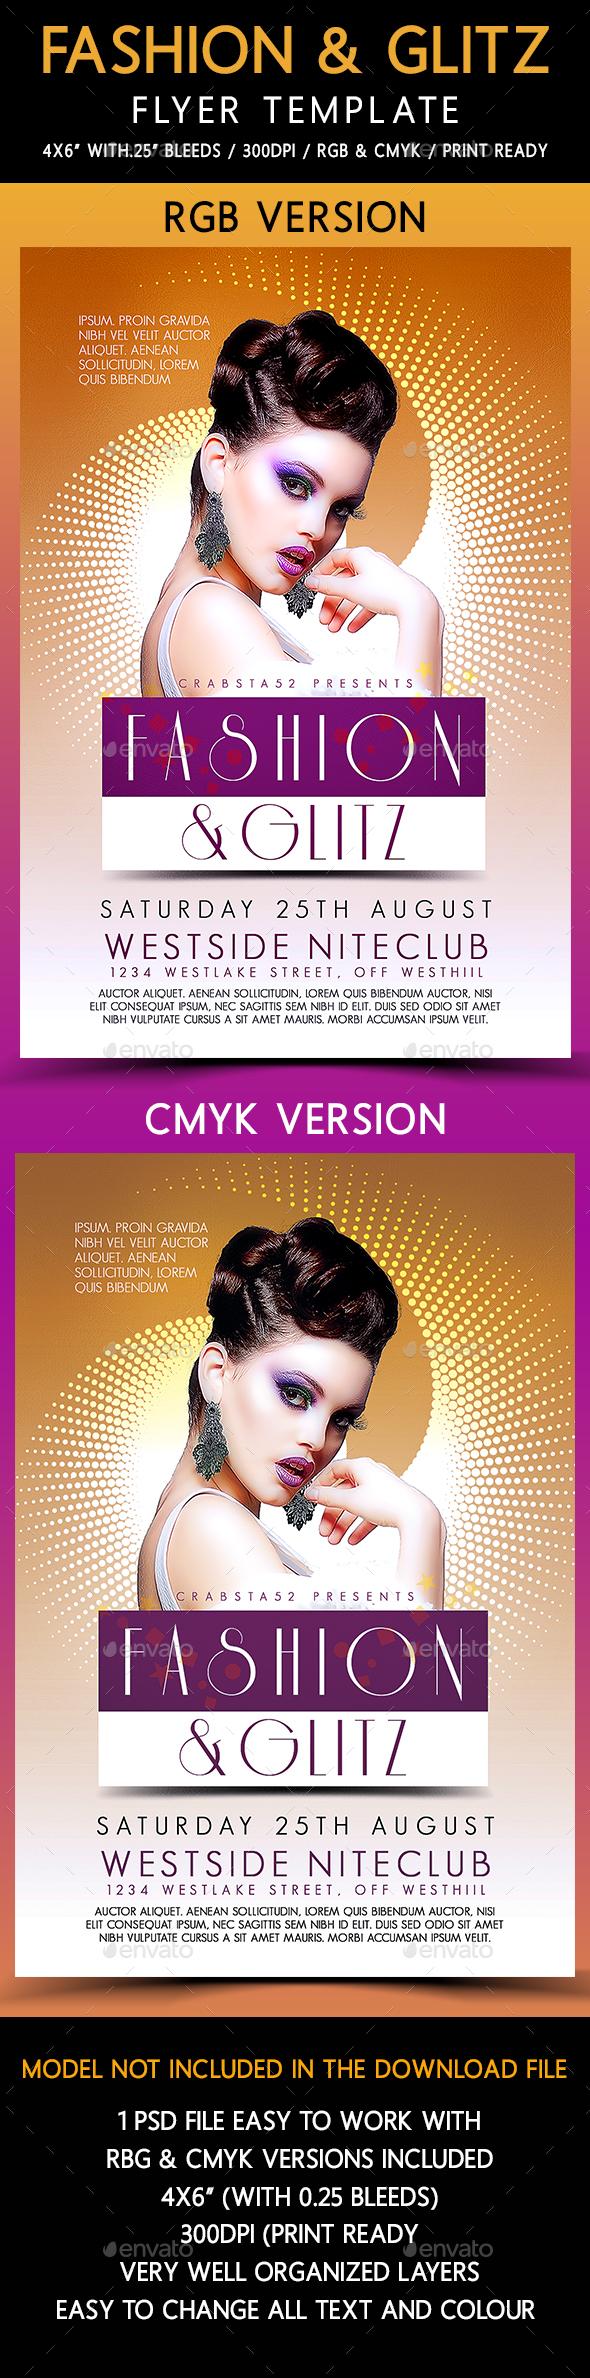 Fashion & Glitz Flyer Template - Flyers Print Templates